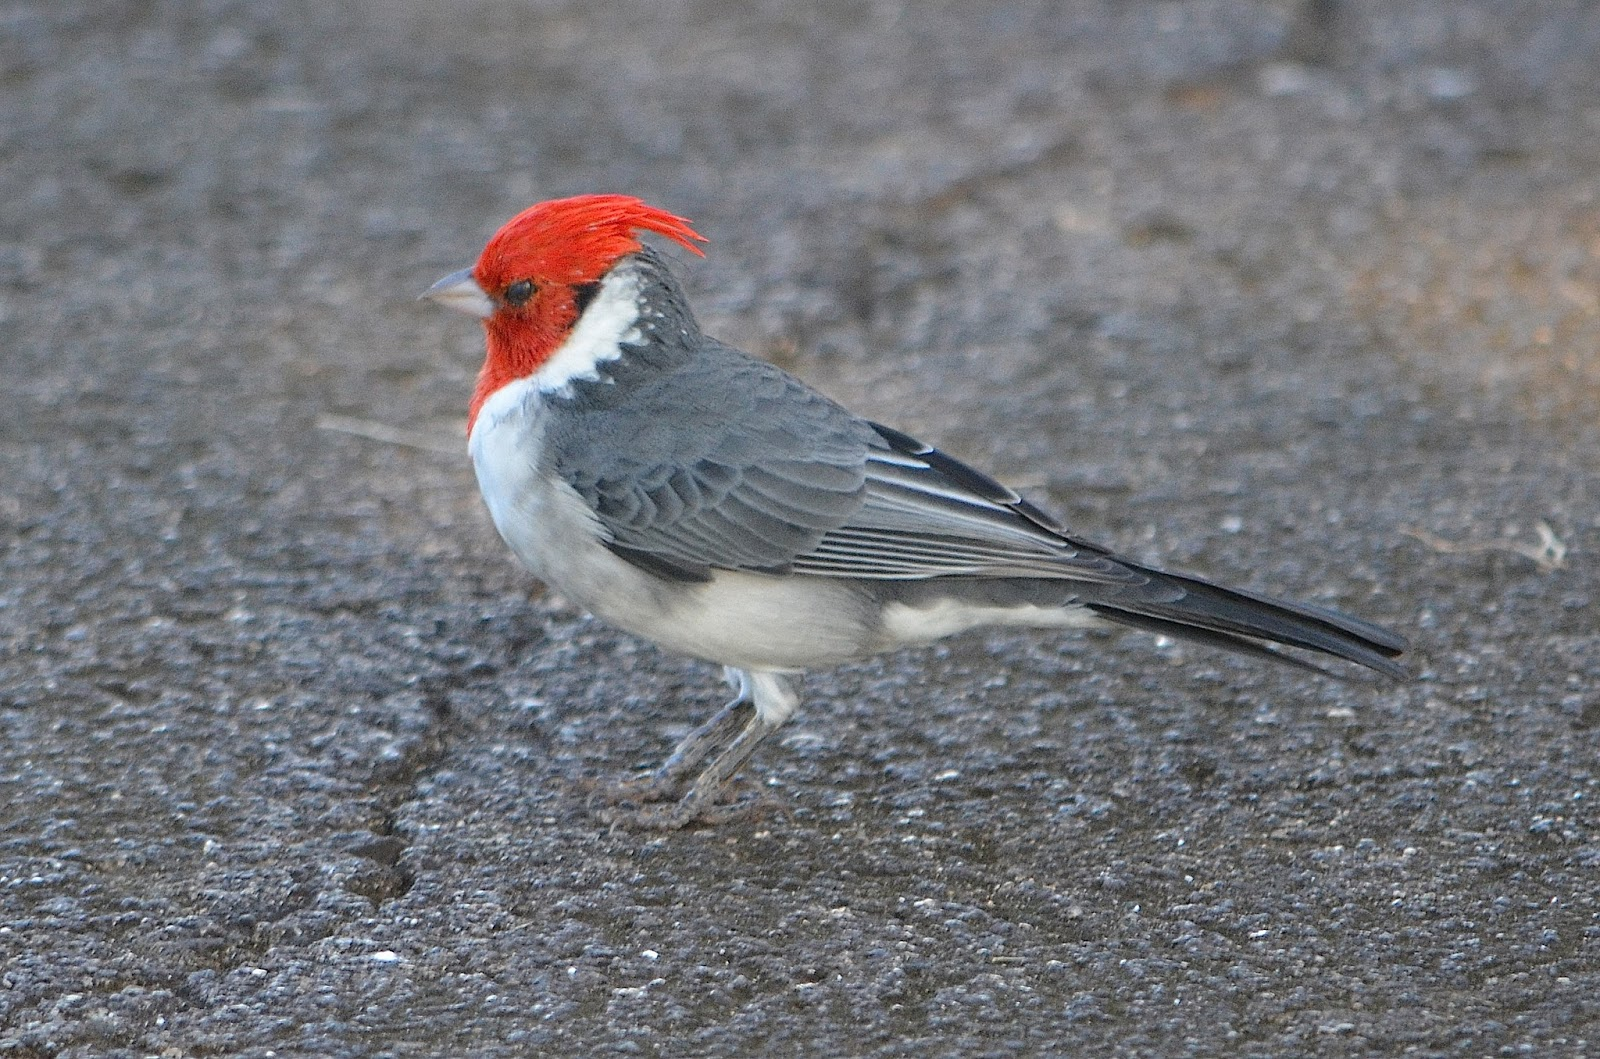 Red Hawaiian Bird This Bird Has a Red Head And